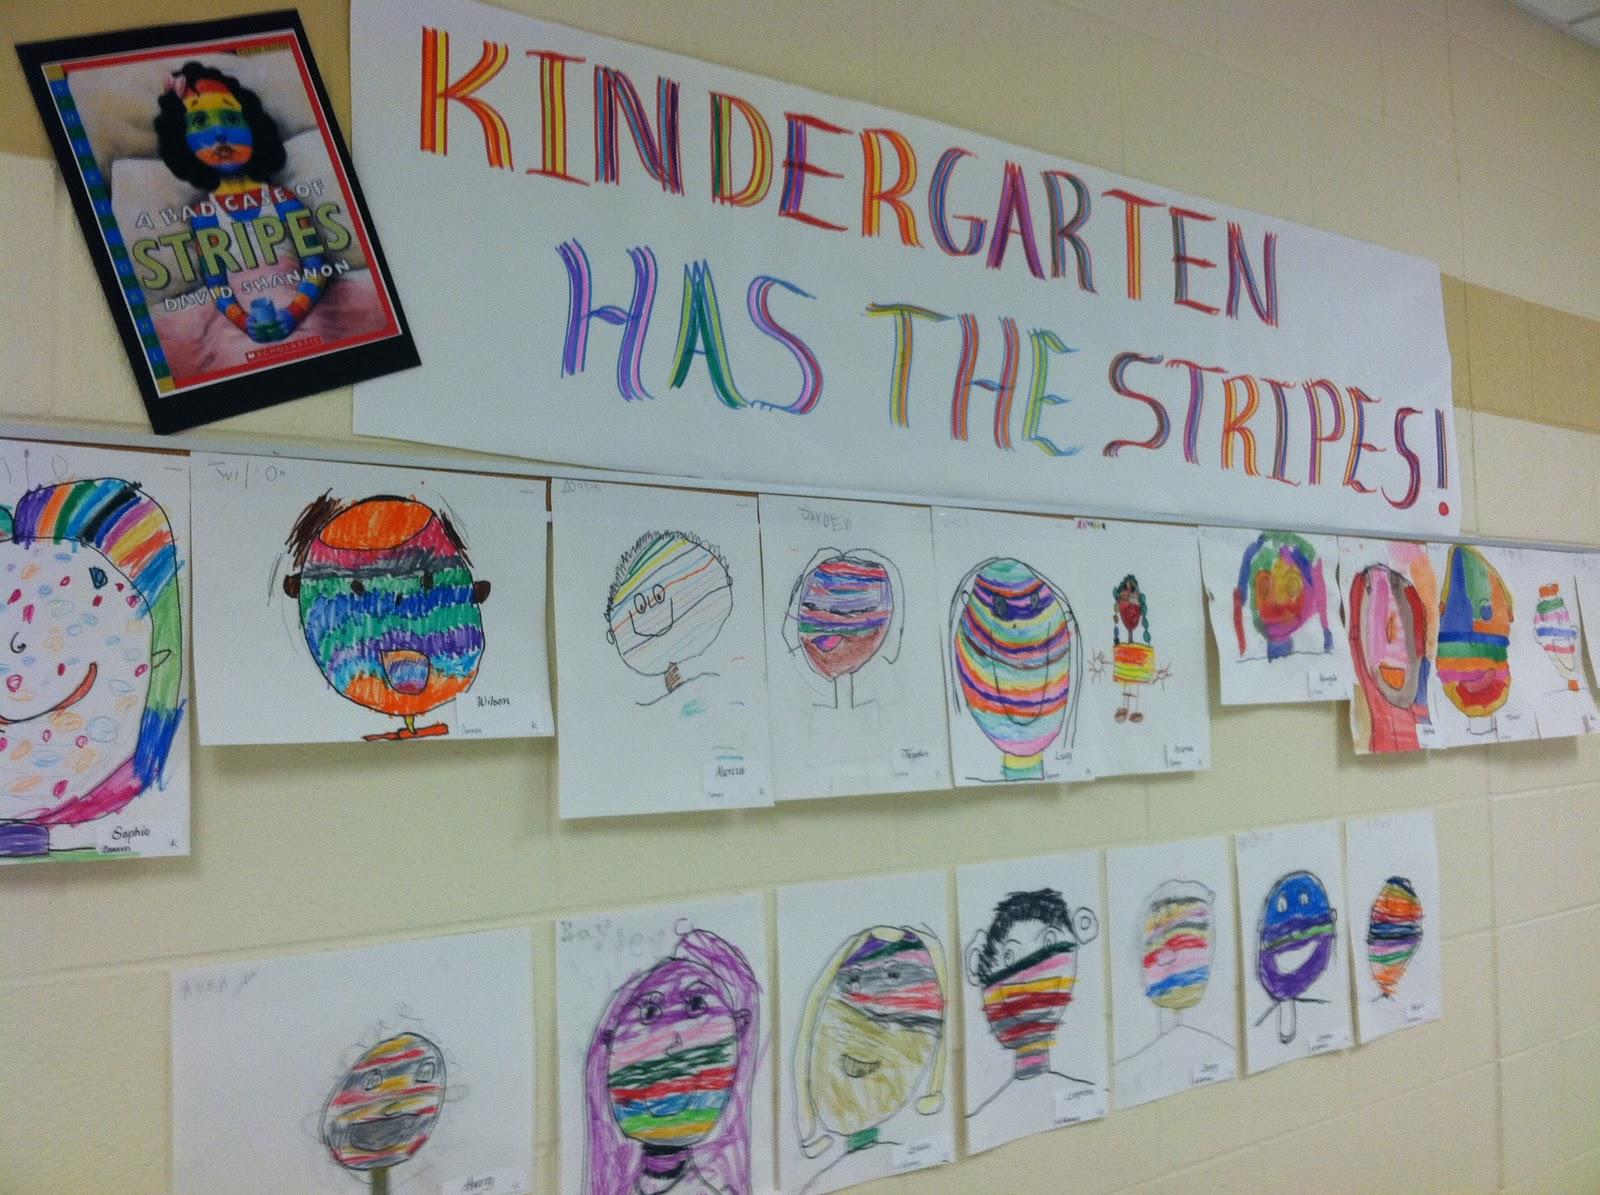 O Neill S Art Room Kindergarten Has The Stripes